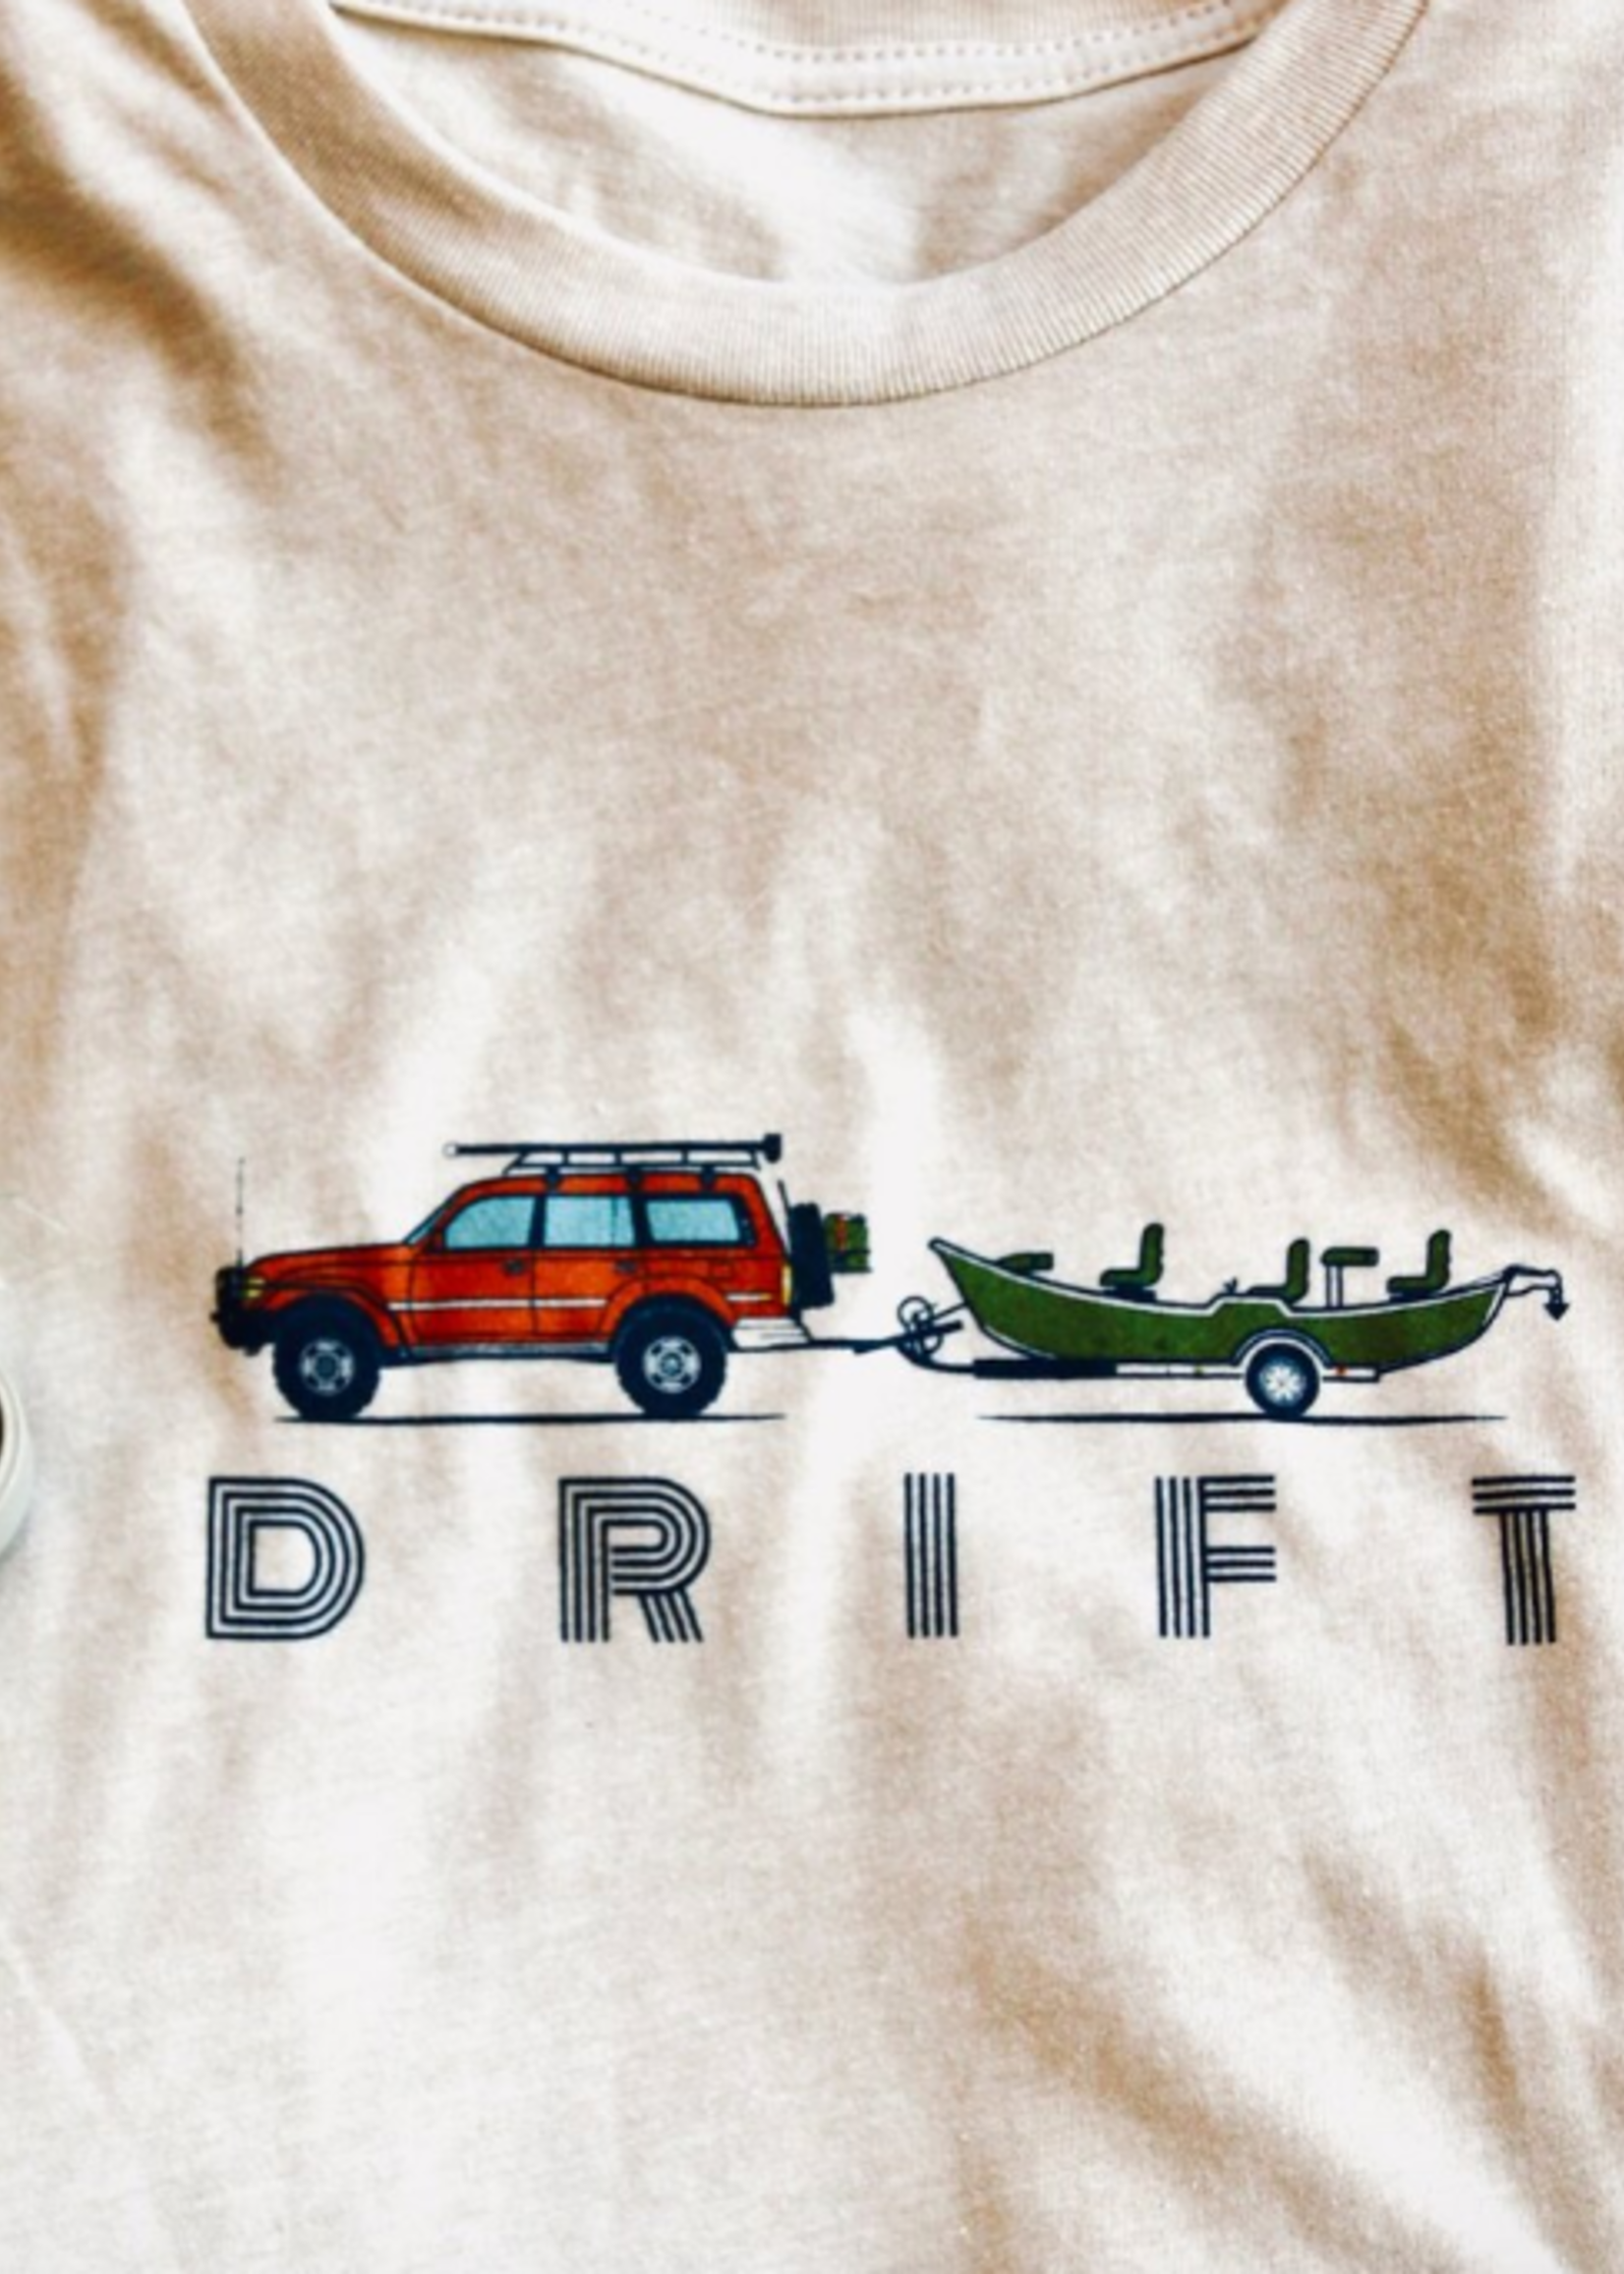 Drift Fly Co. Land Cruiser Tee